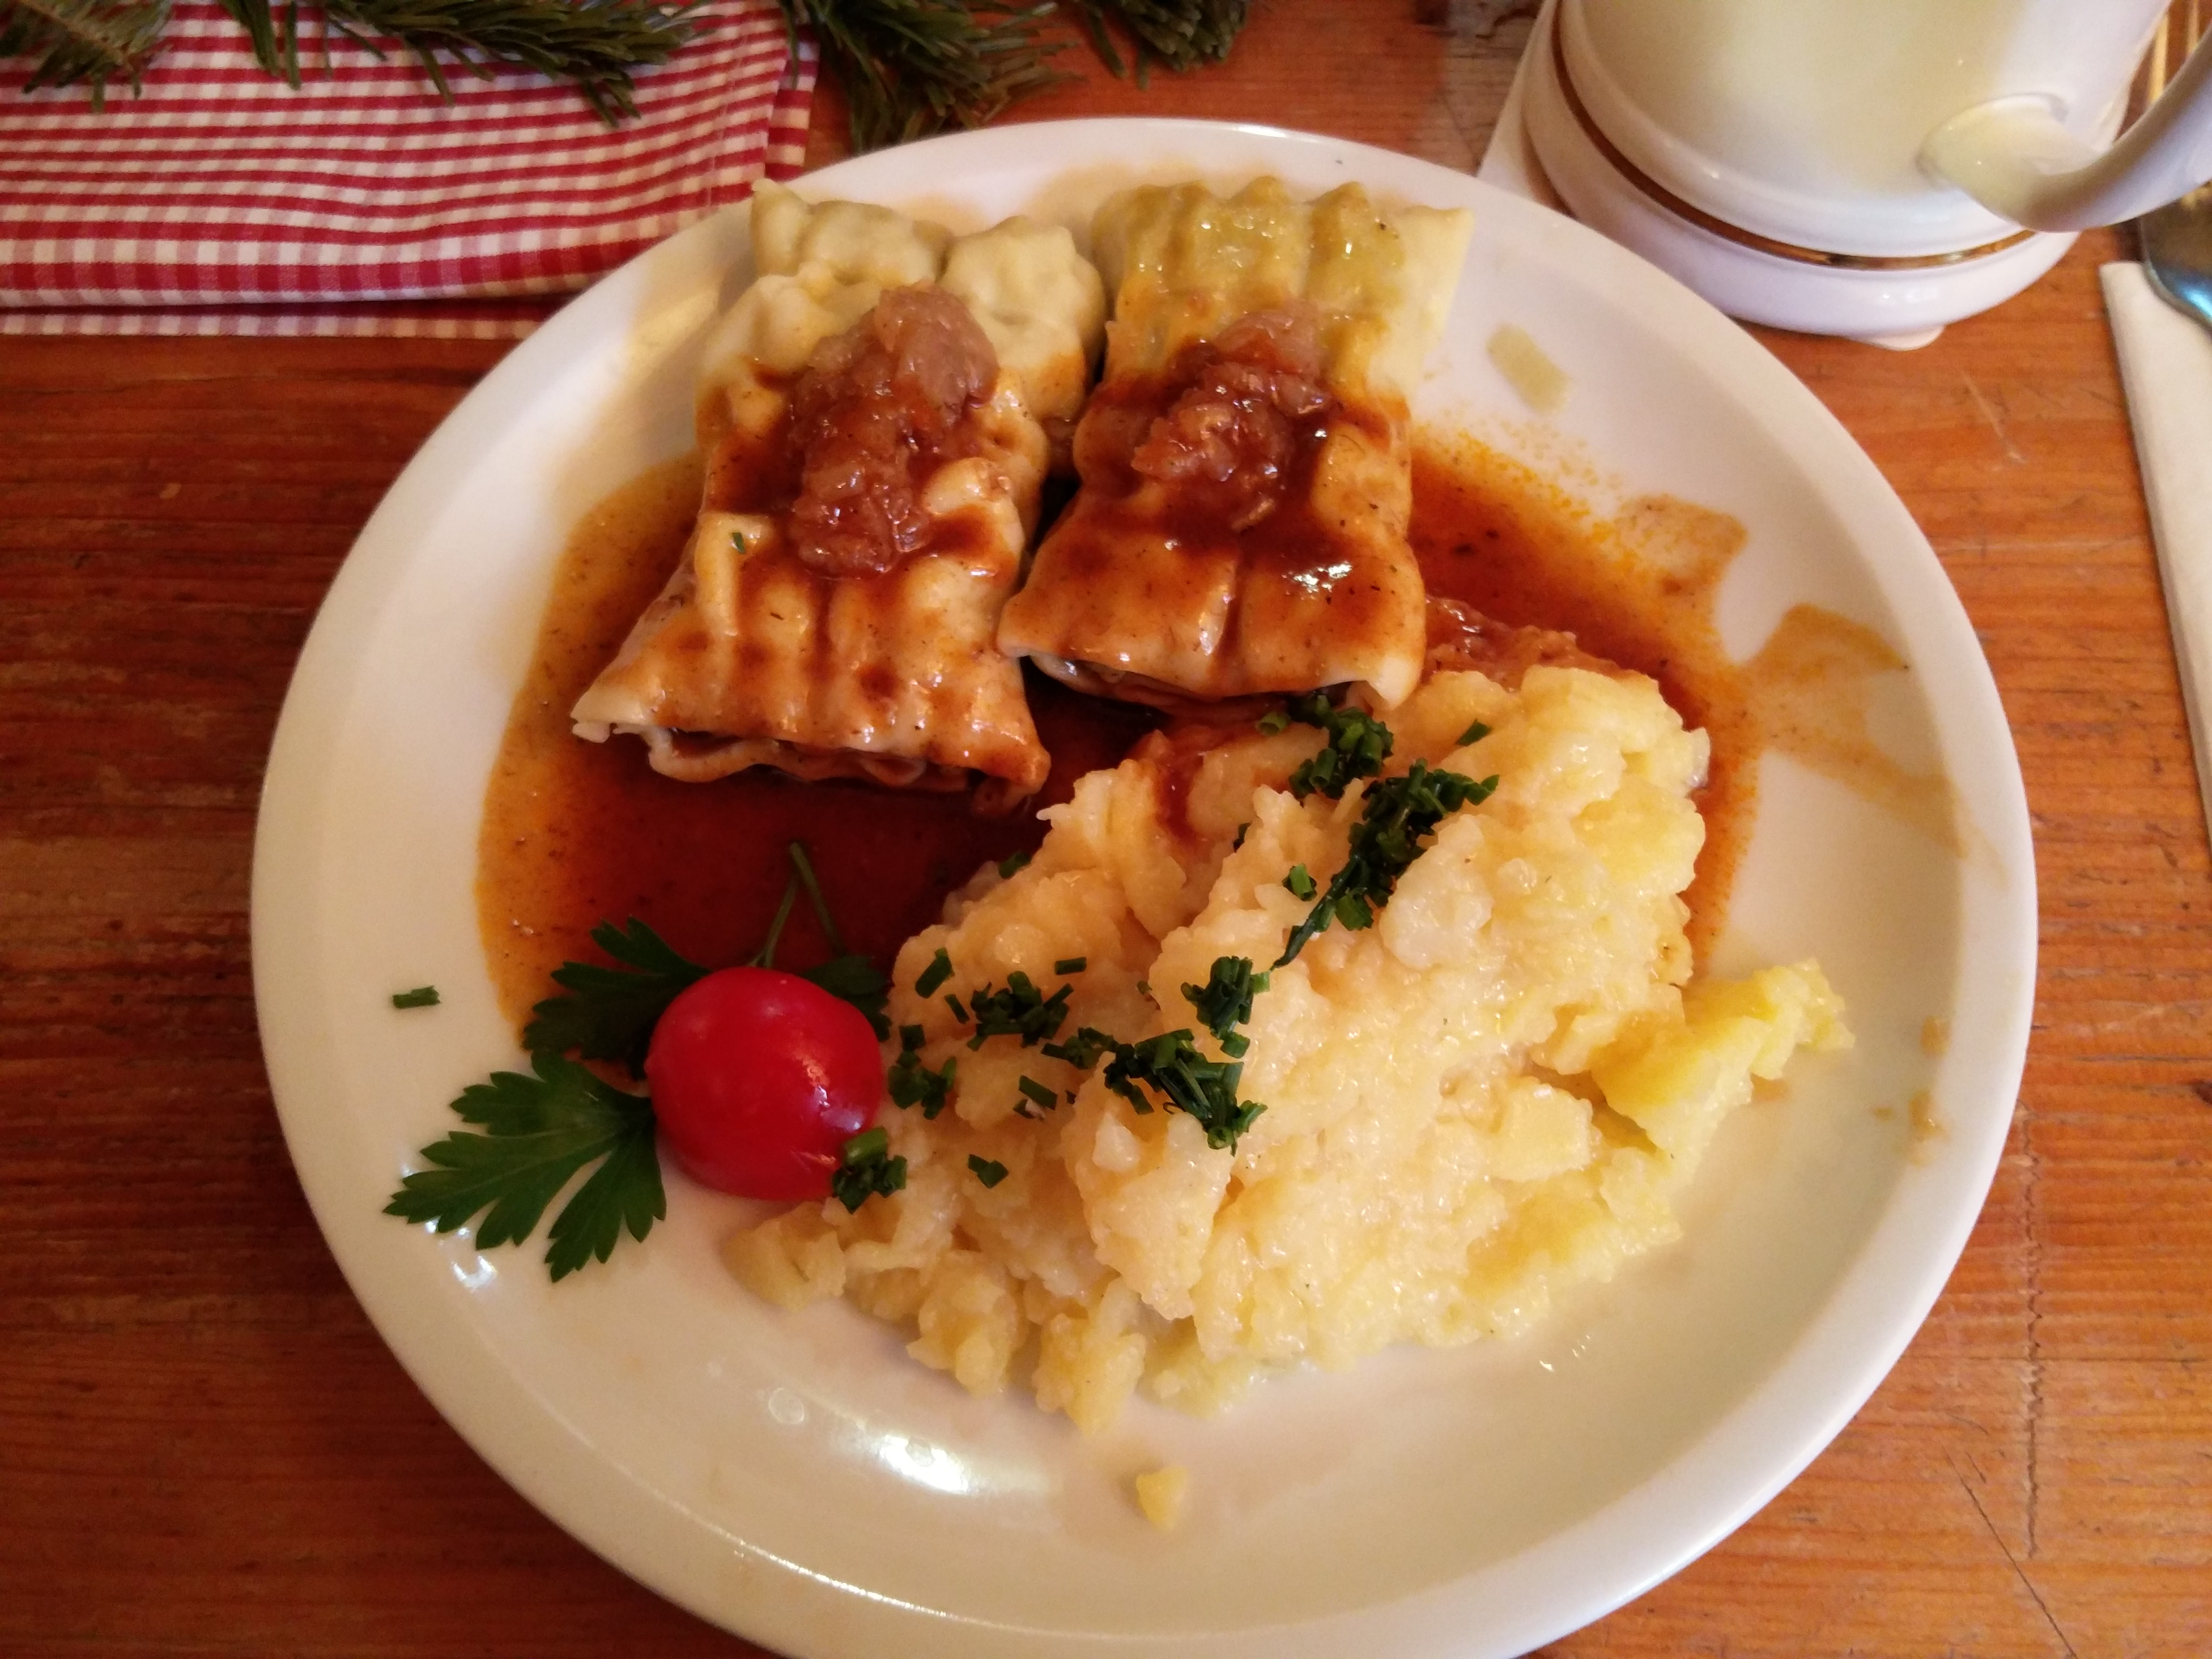 https://foodloader.net/nico_2015-12-17_maultaschen-mit-kartoffelsalat.jpg